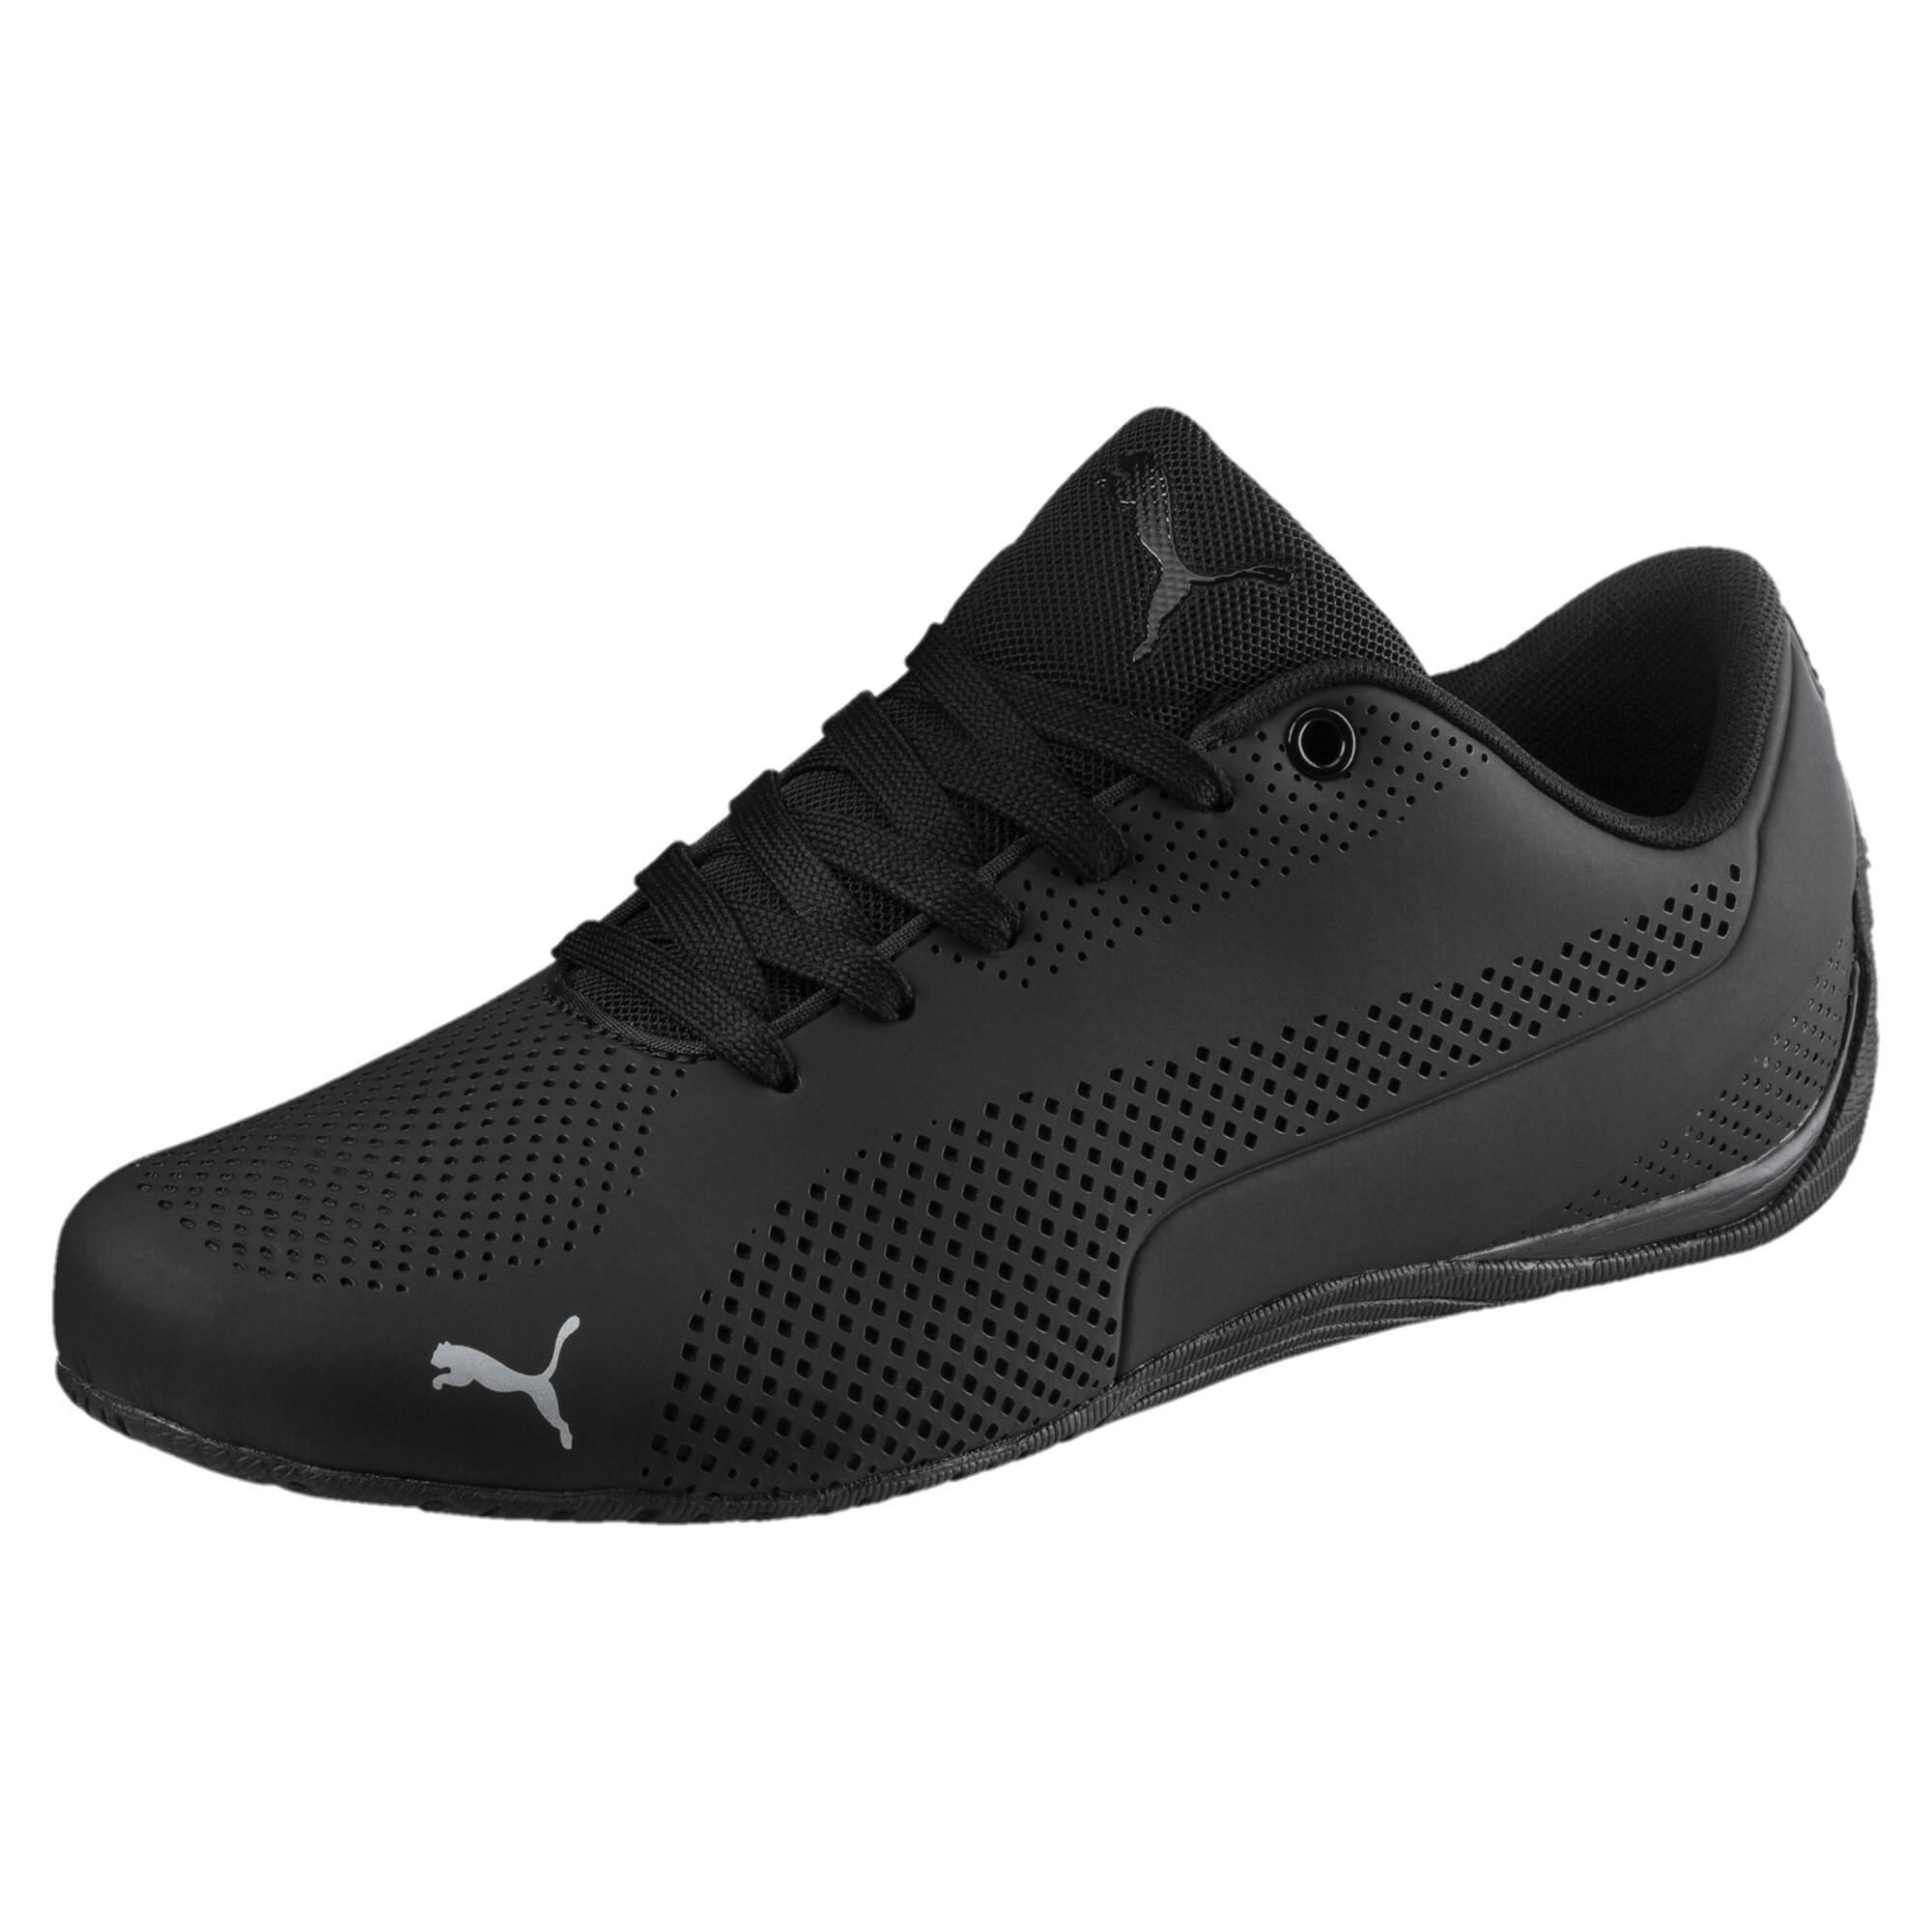 PUMA-Men-039-s-Drift-Cat-Ultra-Reflective-Shoes thumbnail 4